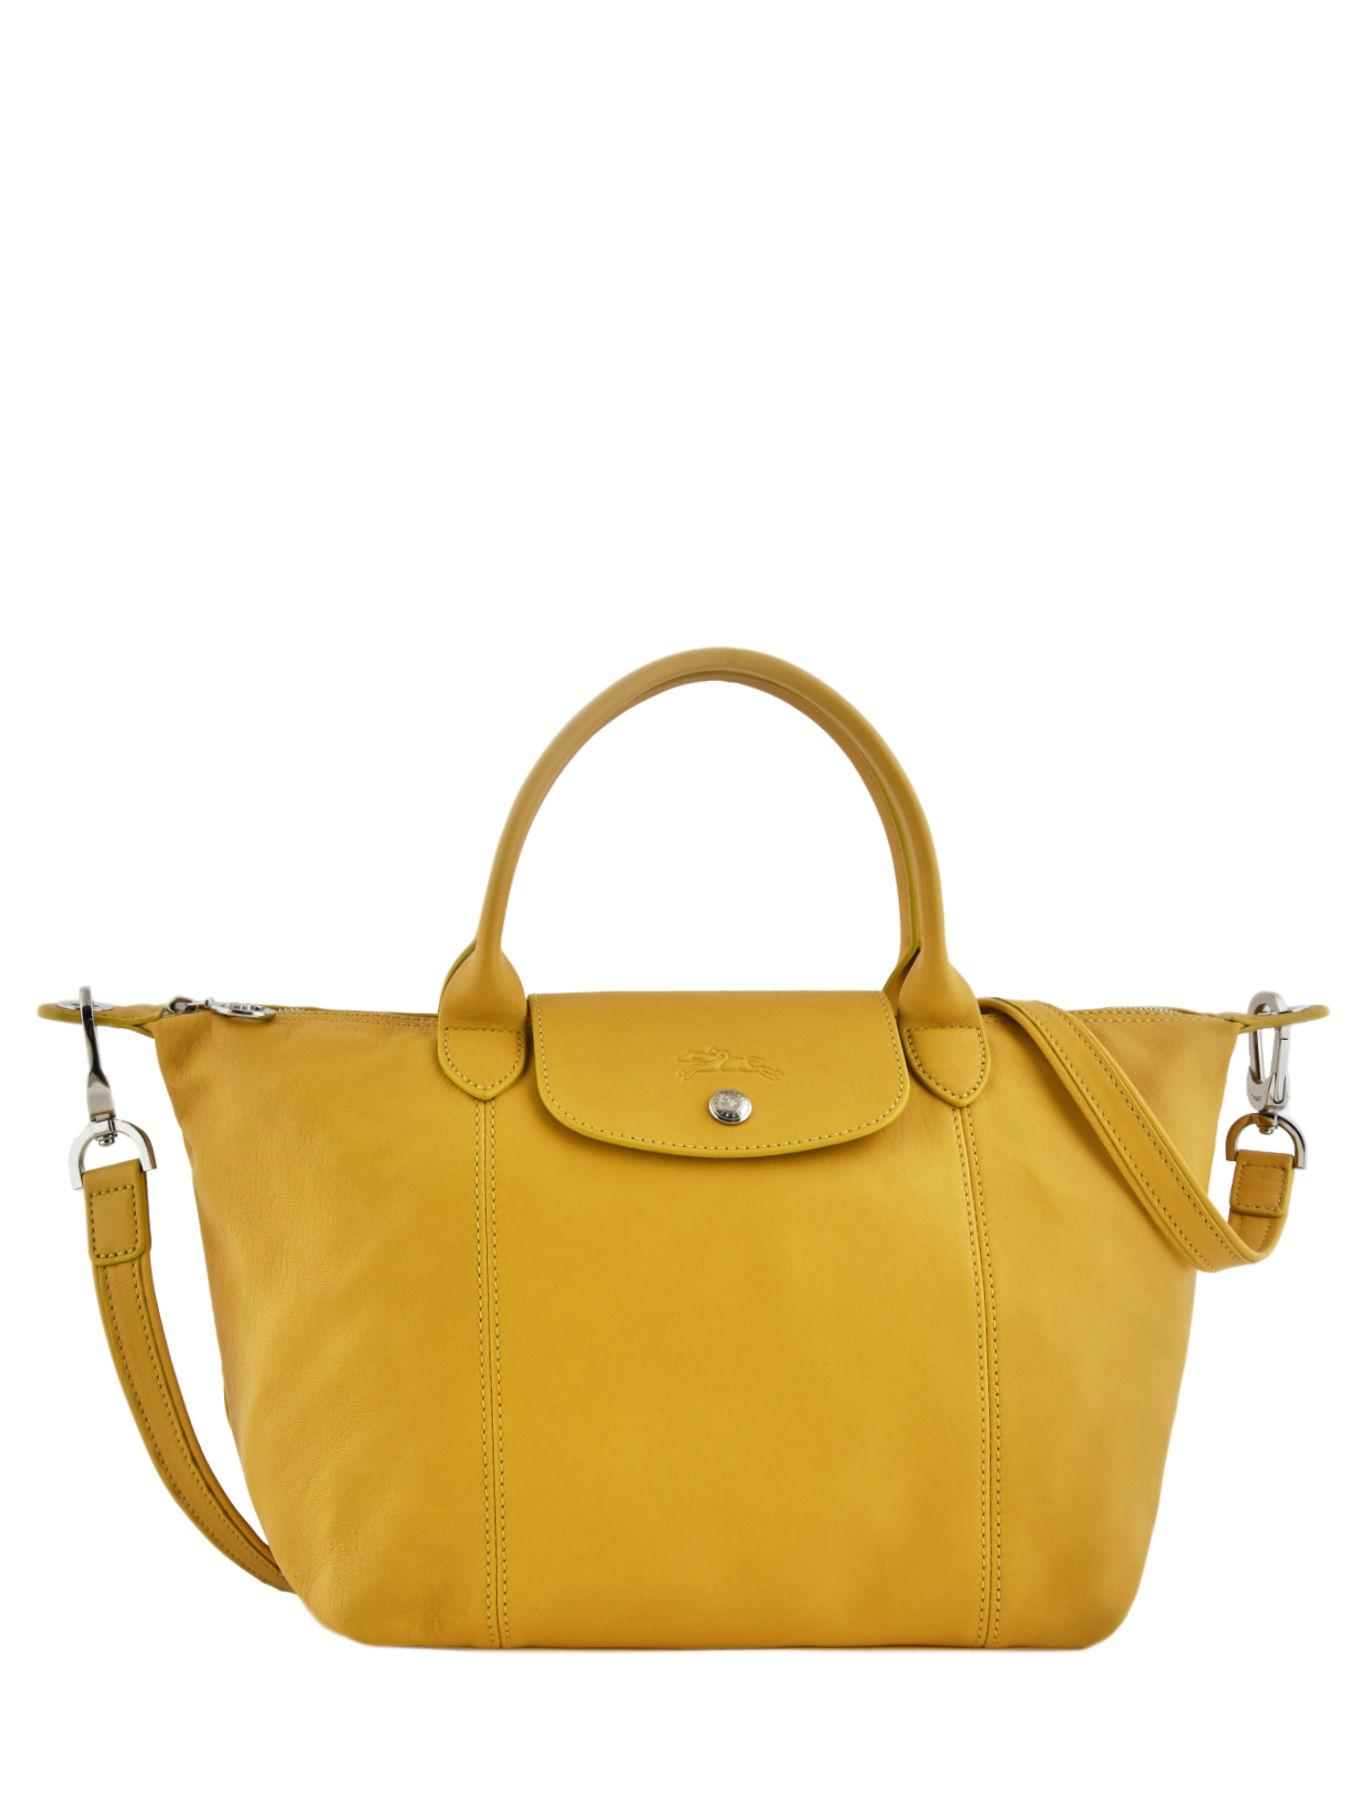 longchamp handbag le pliage cuir best prices. Black Bedroom Furniture Sets. Home Design Ideas